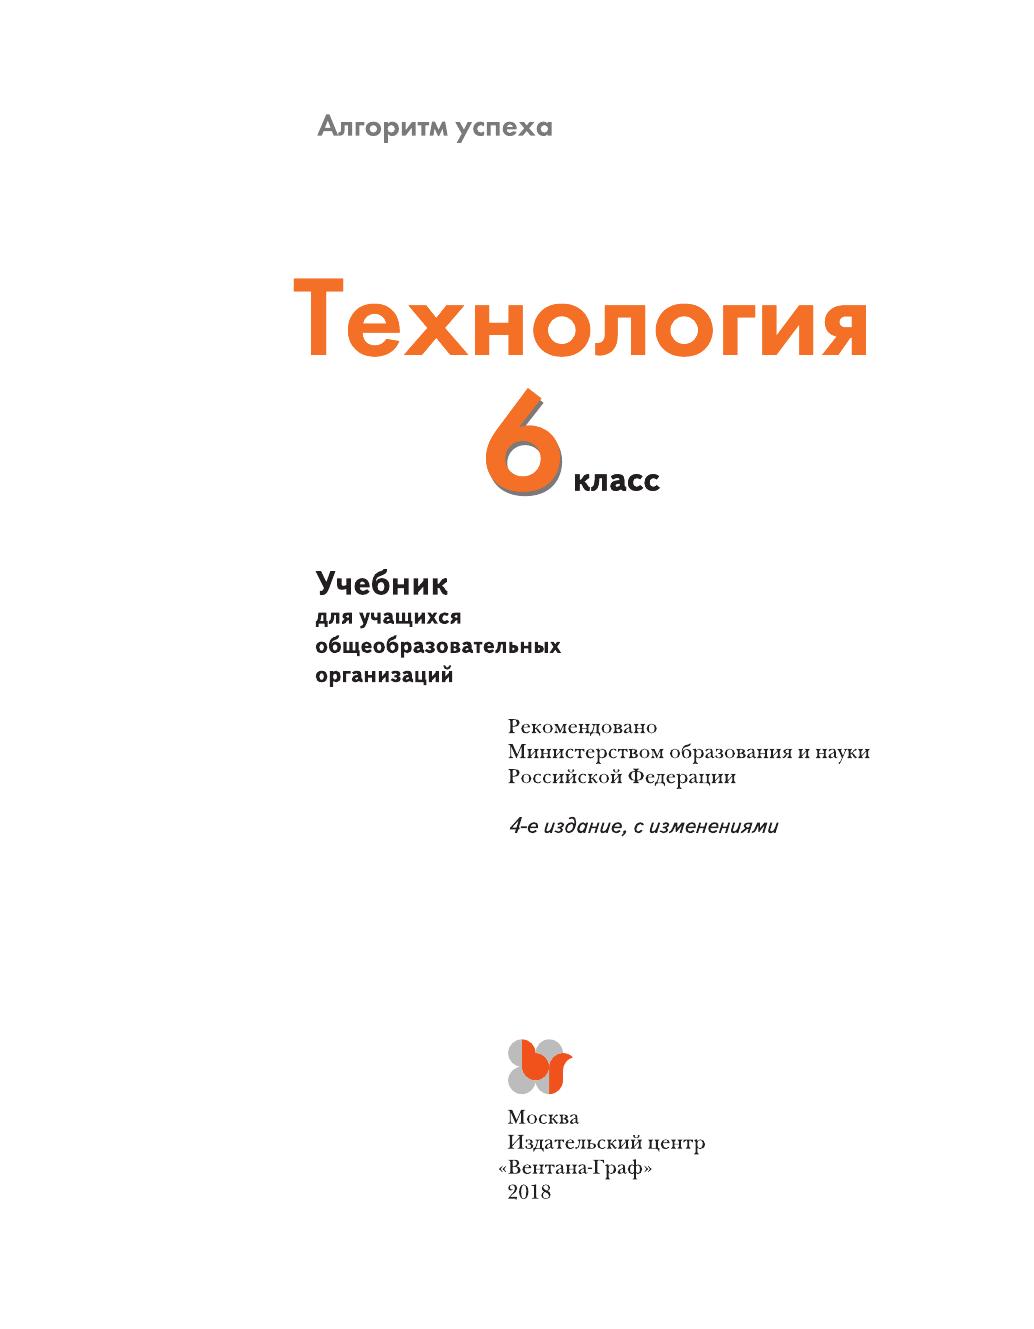 Учебник технологии за 6 класс симоненко виктор смотнрет онлайн